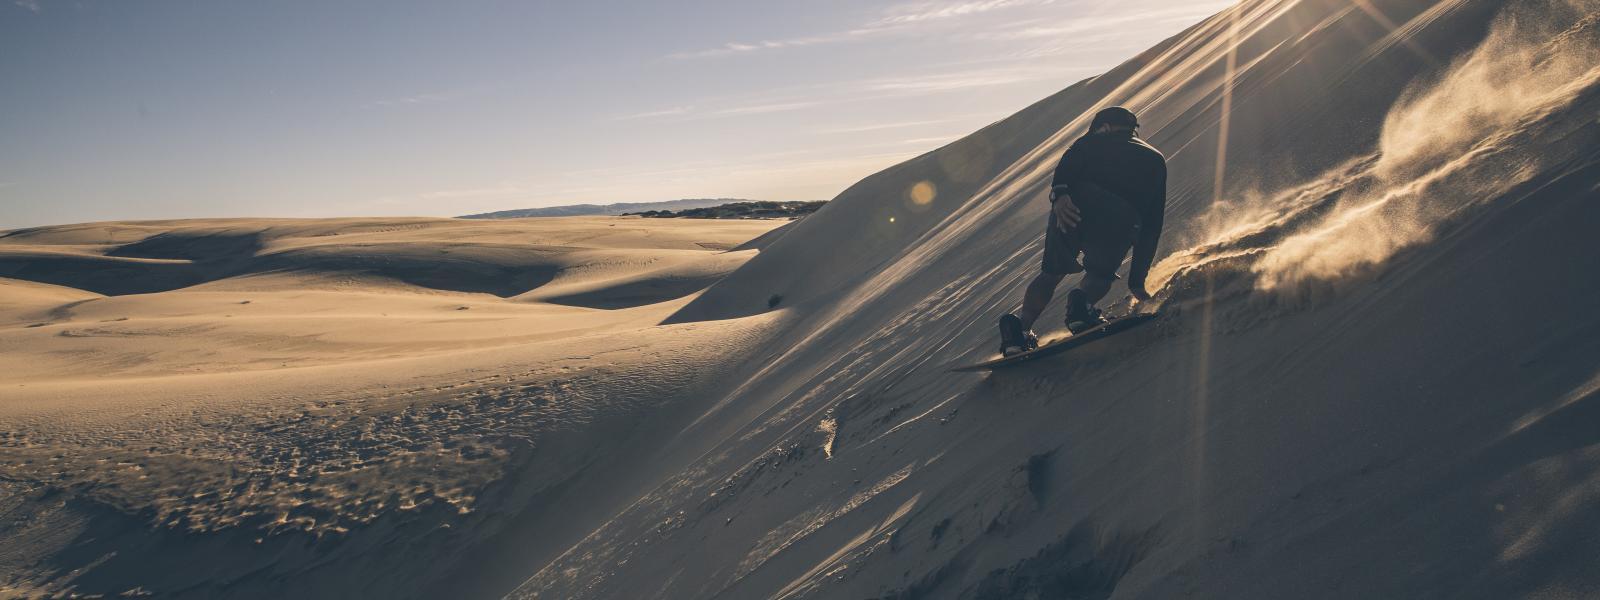 A Sandboarder, boarding down the Oceano Dunes